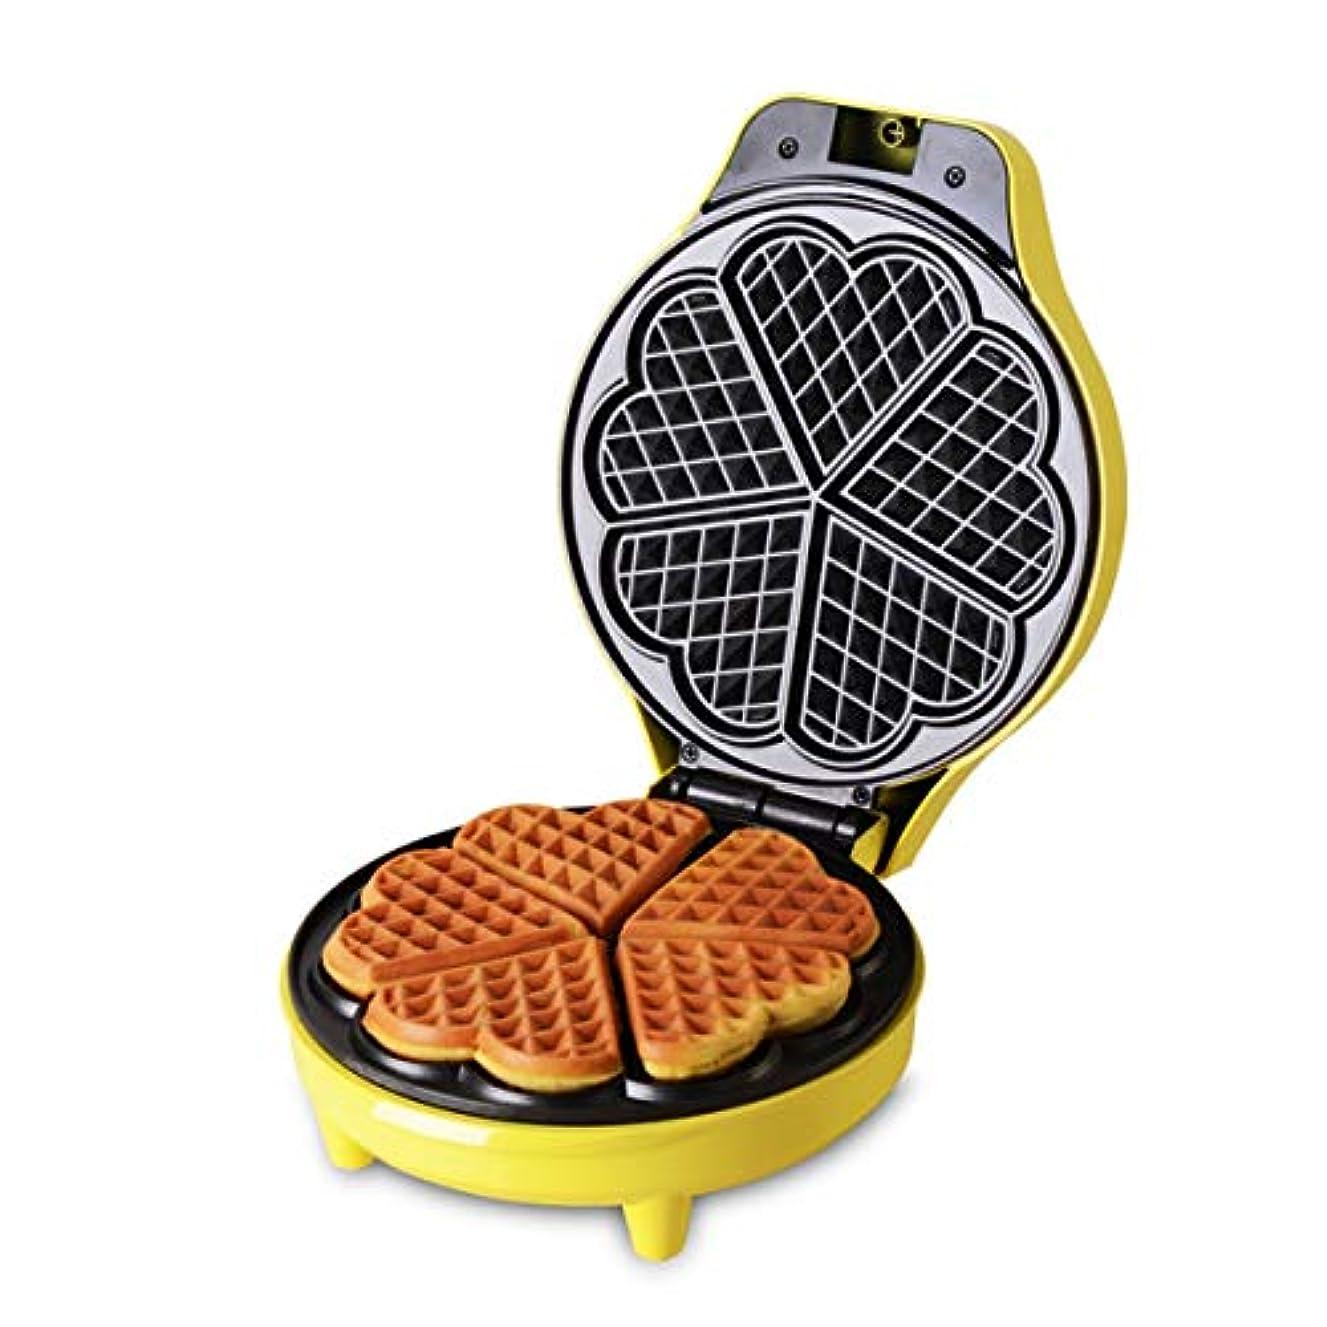 WYQSZ - waffle maker Waffle Machine-home Cake Machine Automatic Electric Baking Pan Multi-function Waffle Machine - 5547